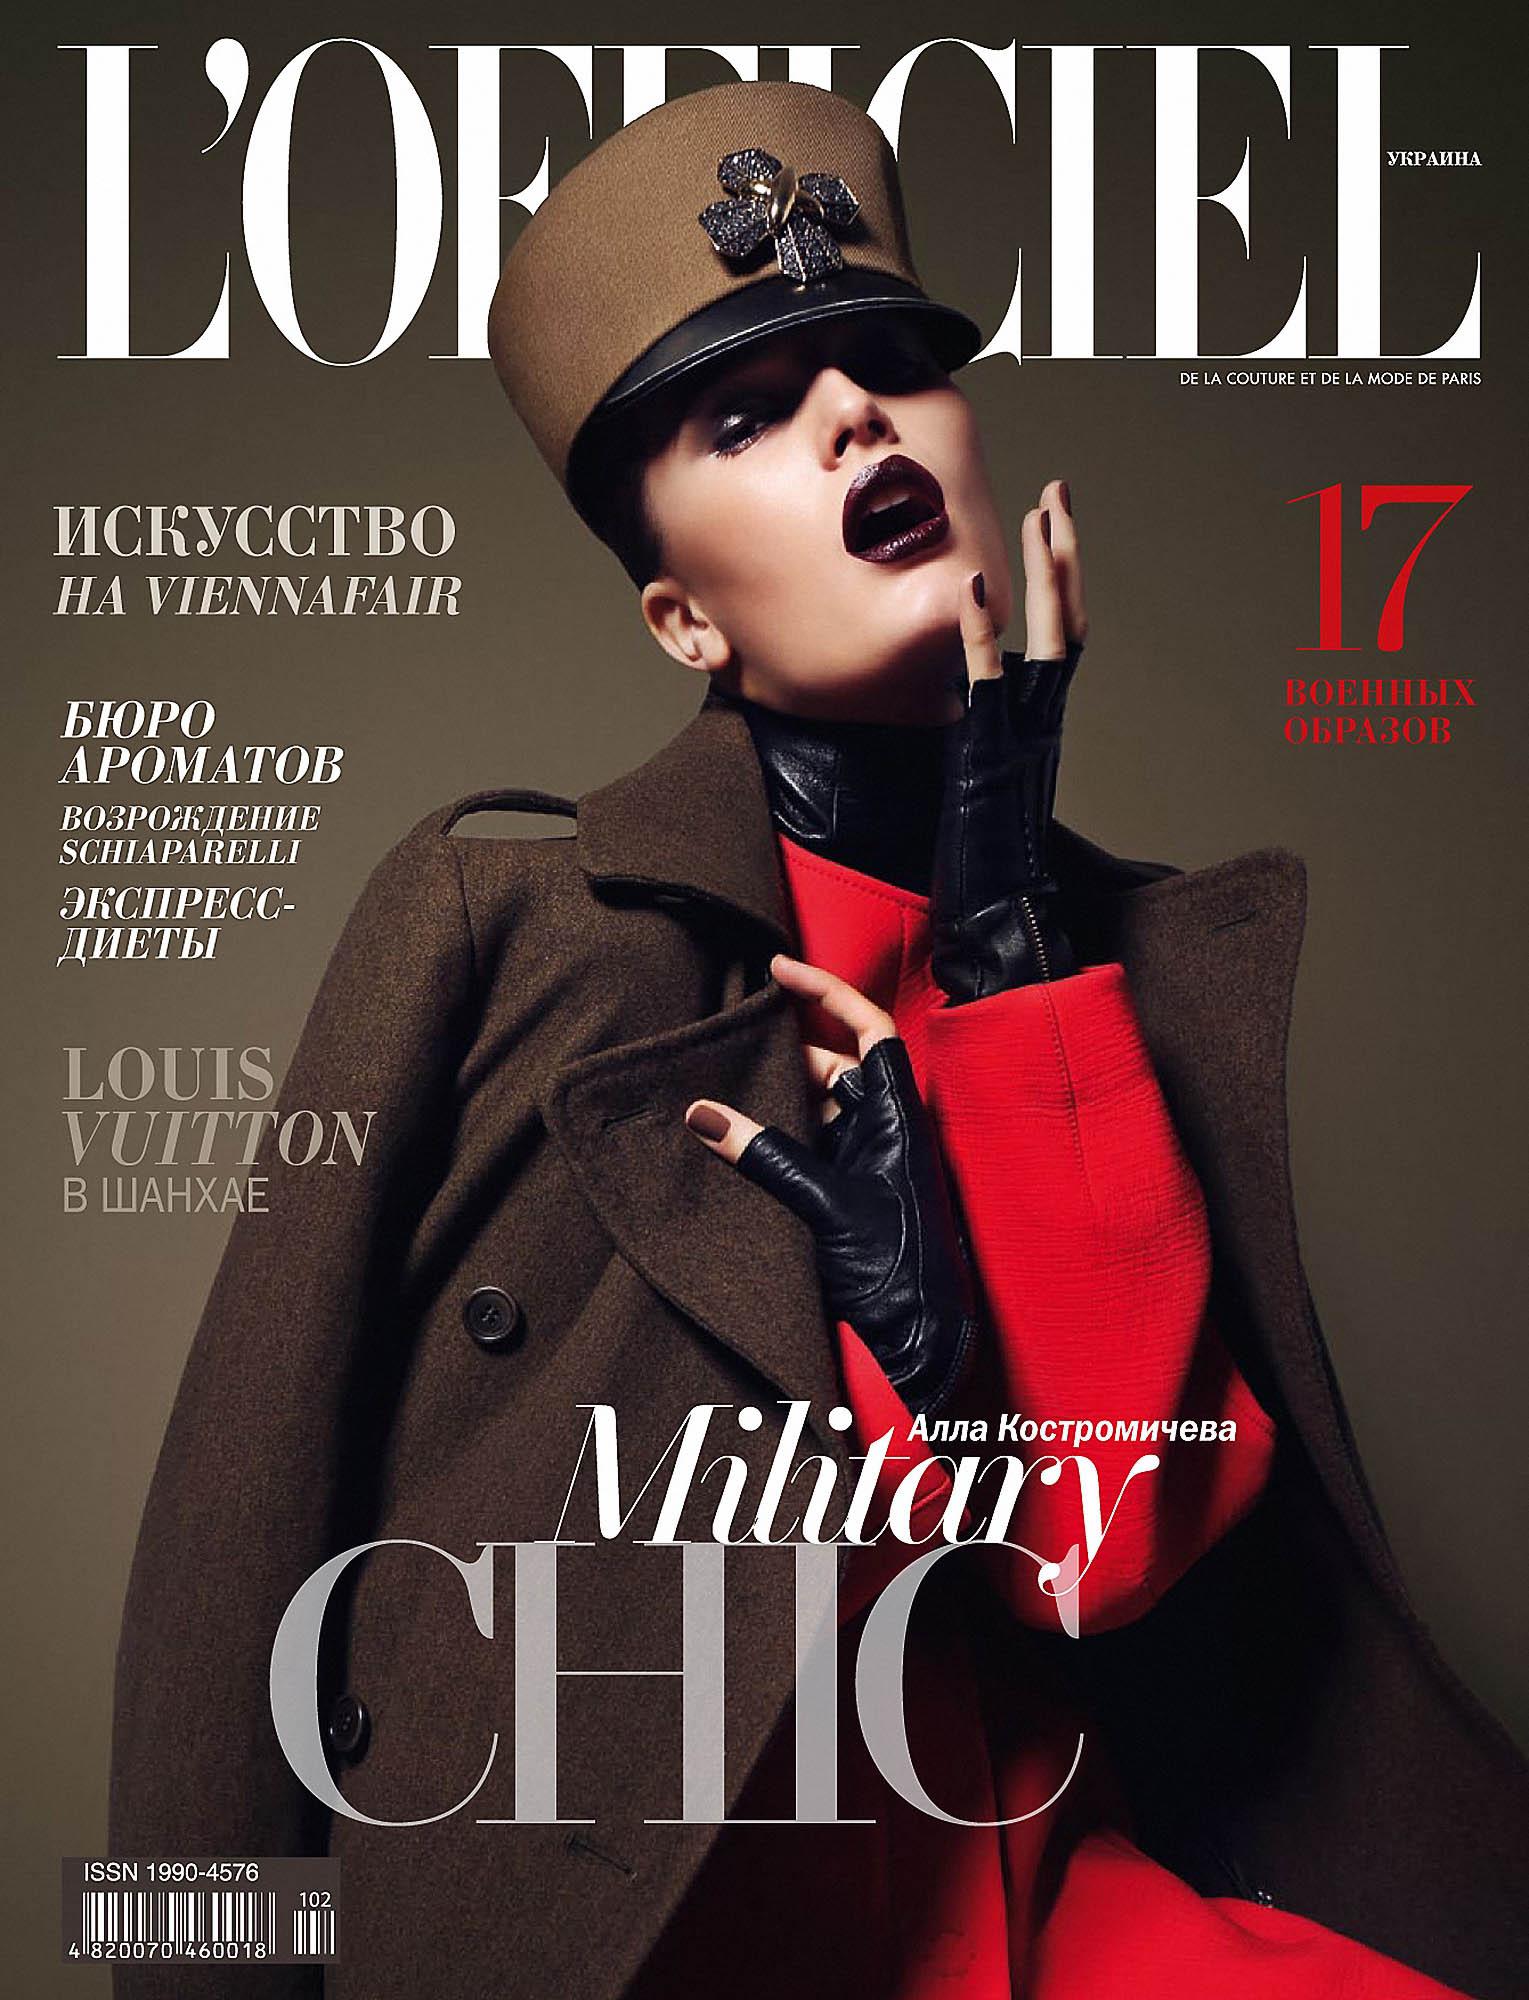 Fashionmonger - Página 4 LOfficiel-Ukraine_cover